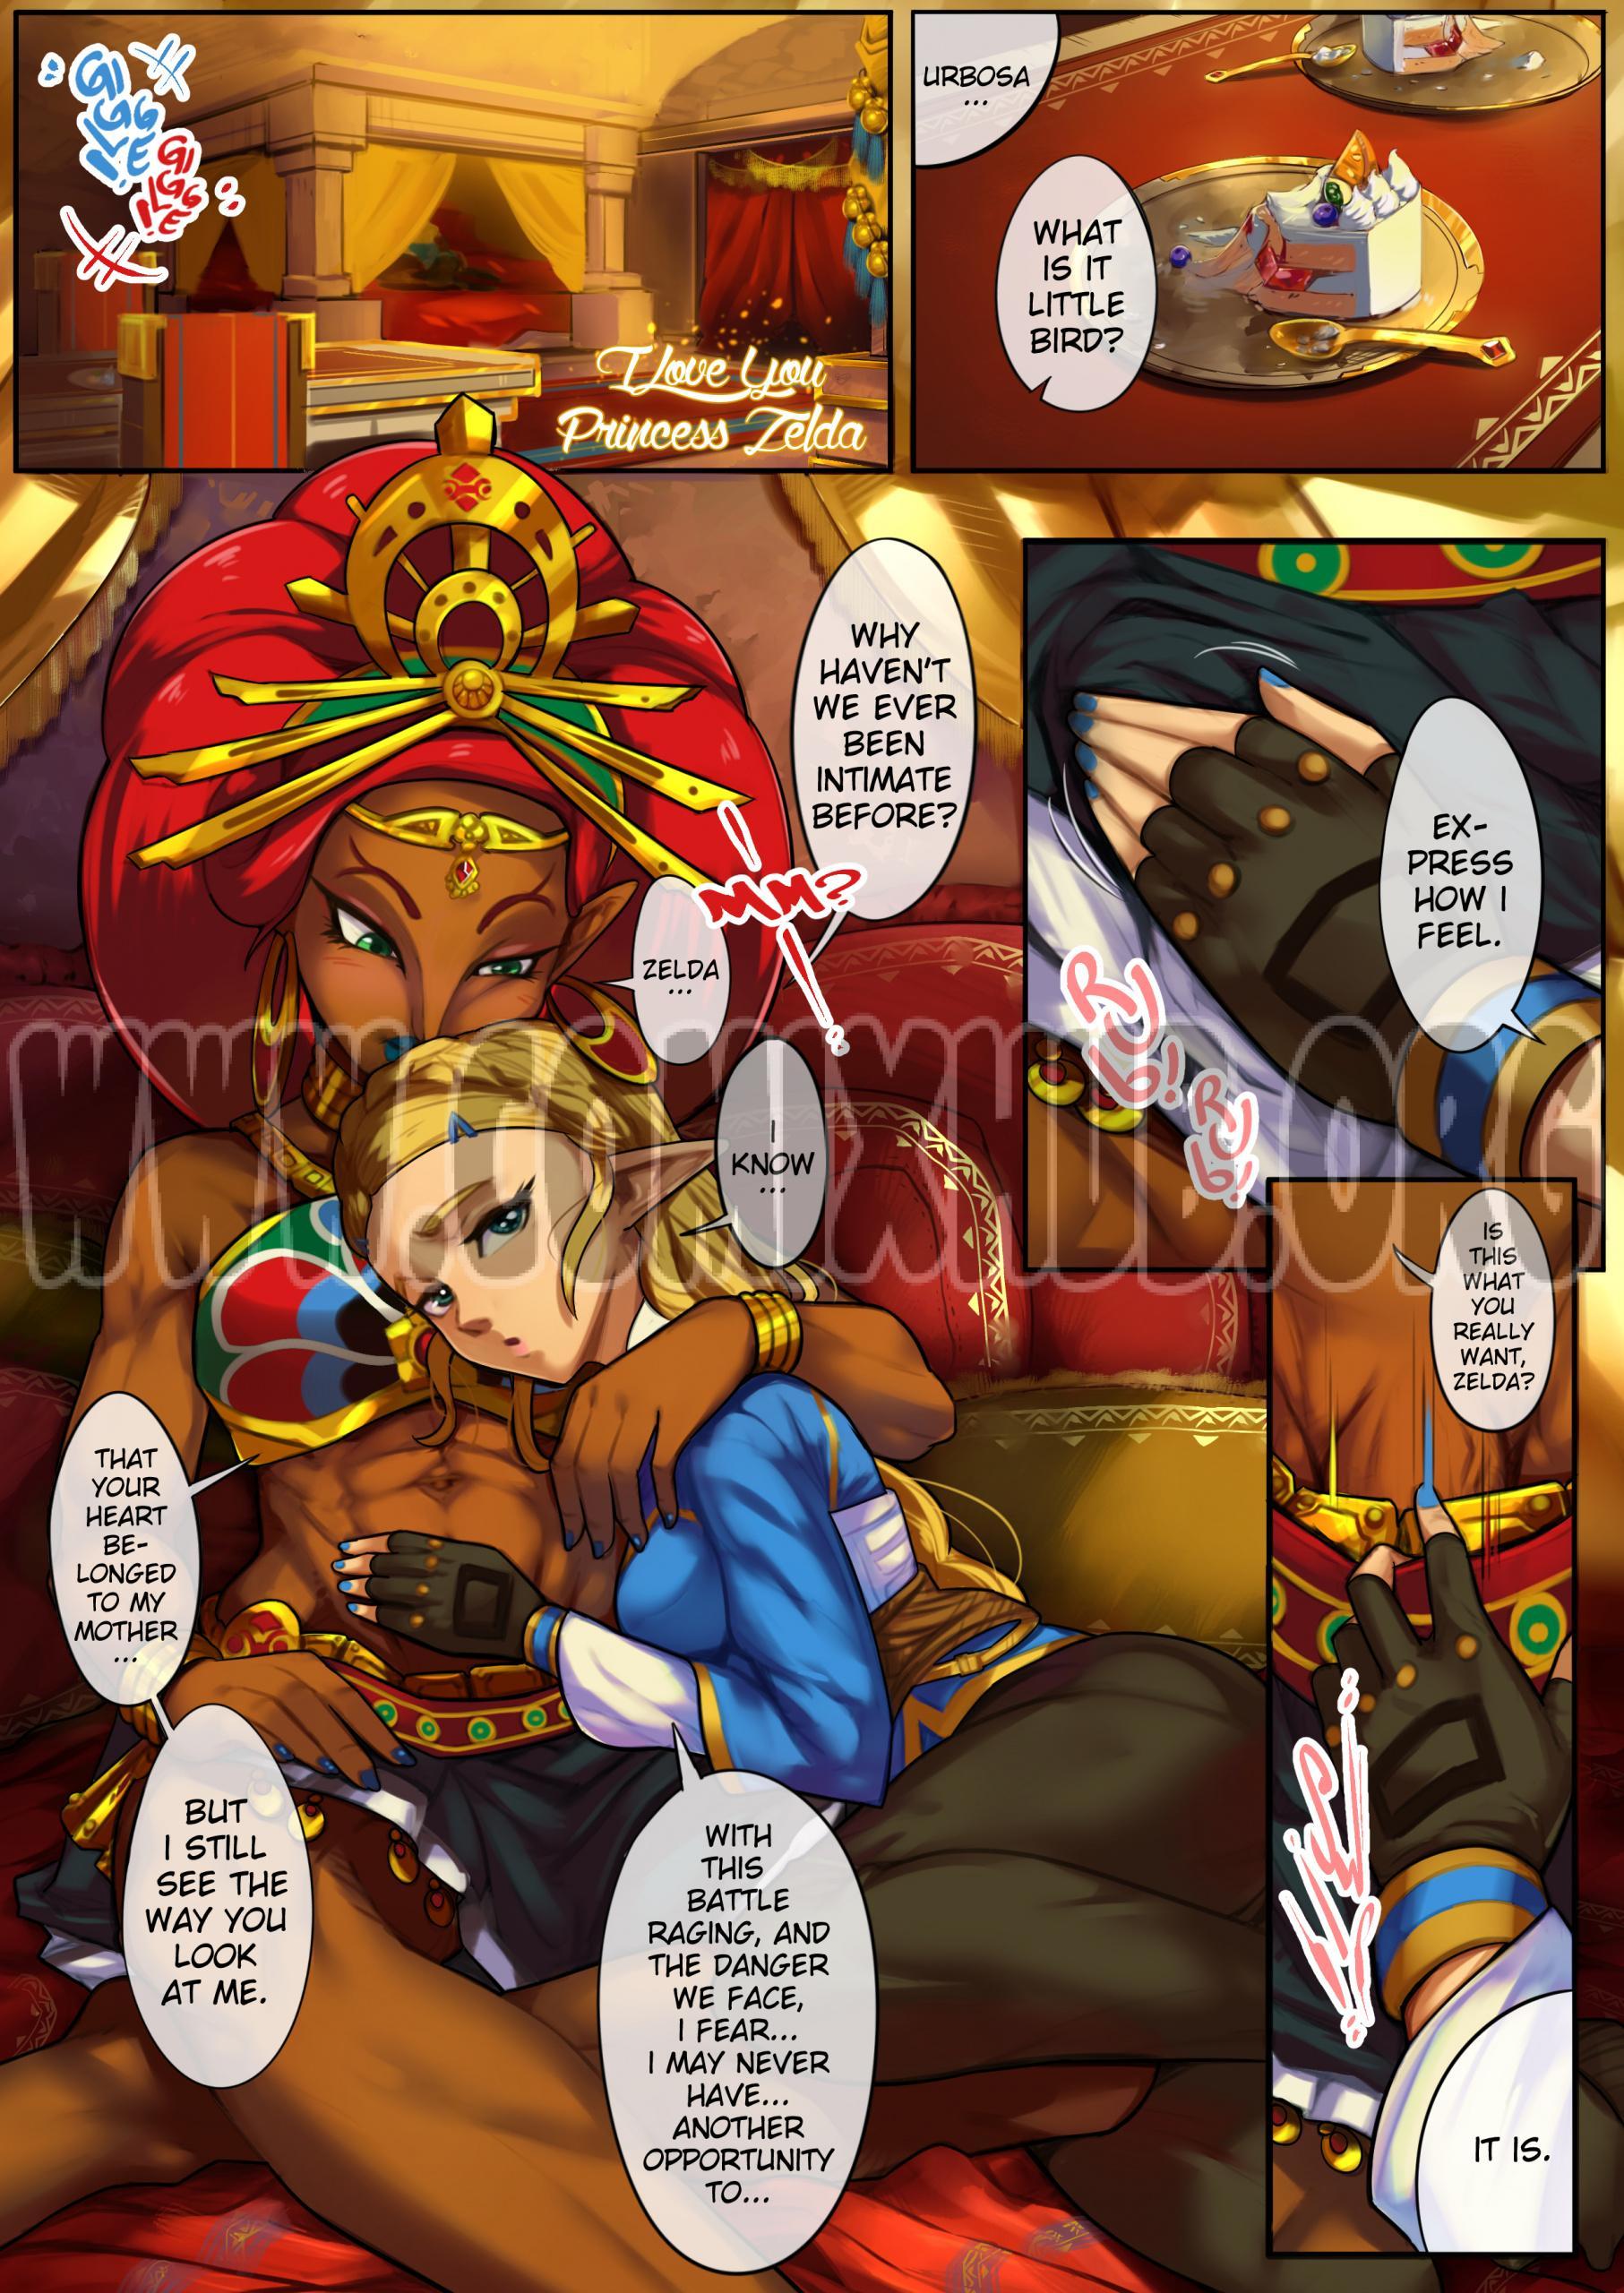 I Love You Princess Zelda Oral sex, Blowjob, Creampie, Deepthroat, Elf, Fantasy, Futanari, Straight